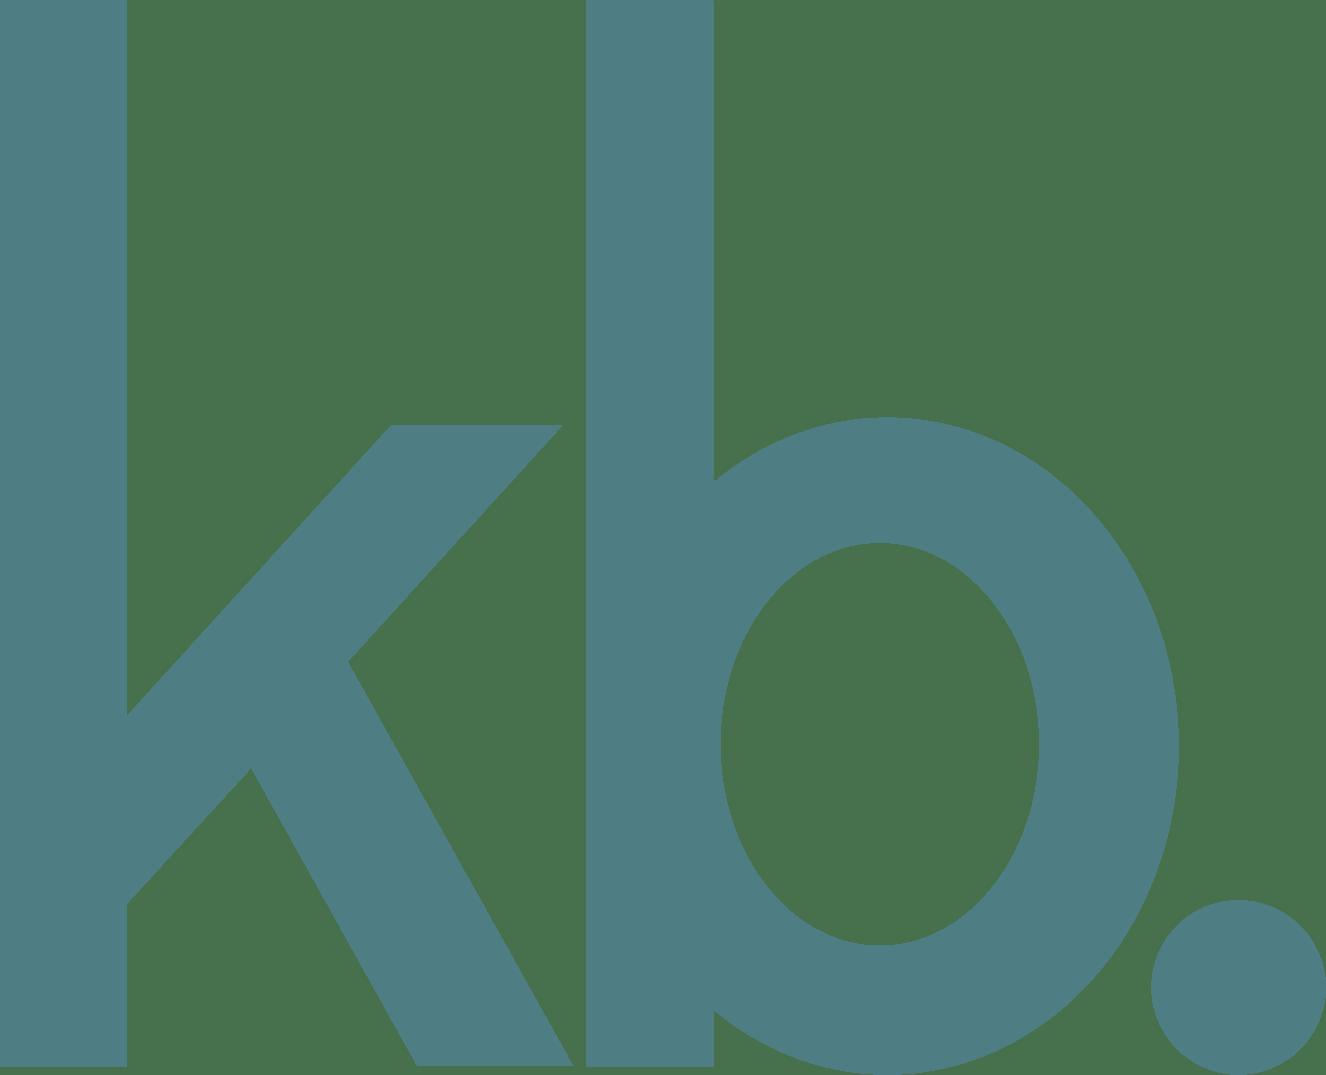 kb. Branding aus Hamburg